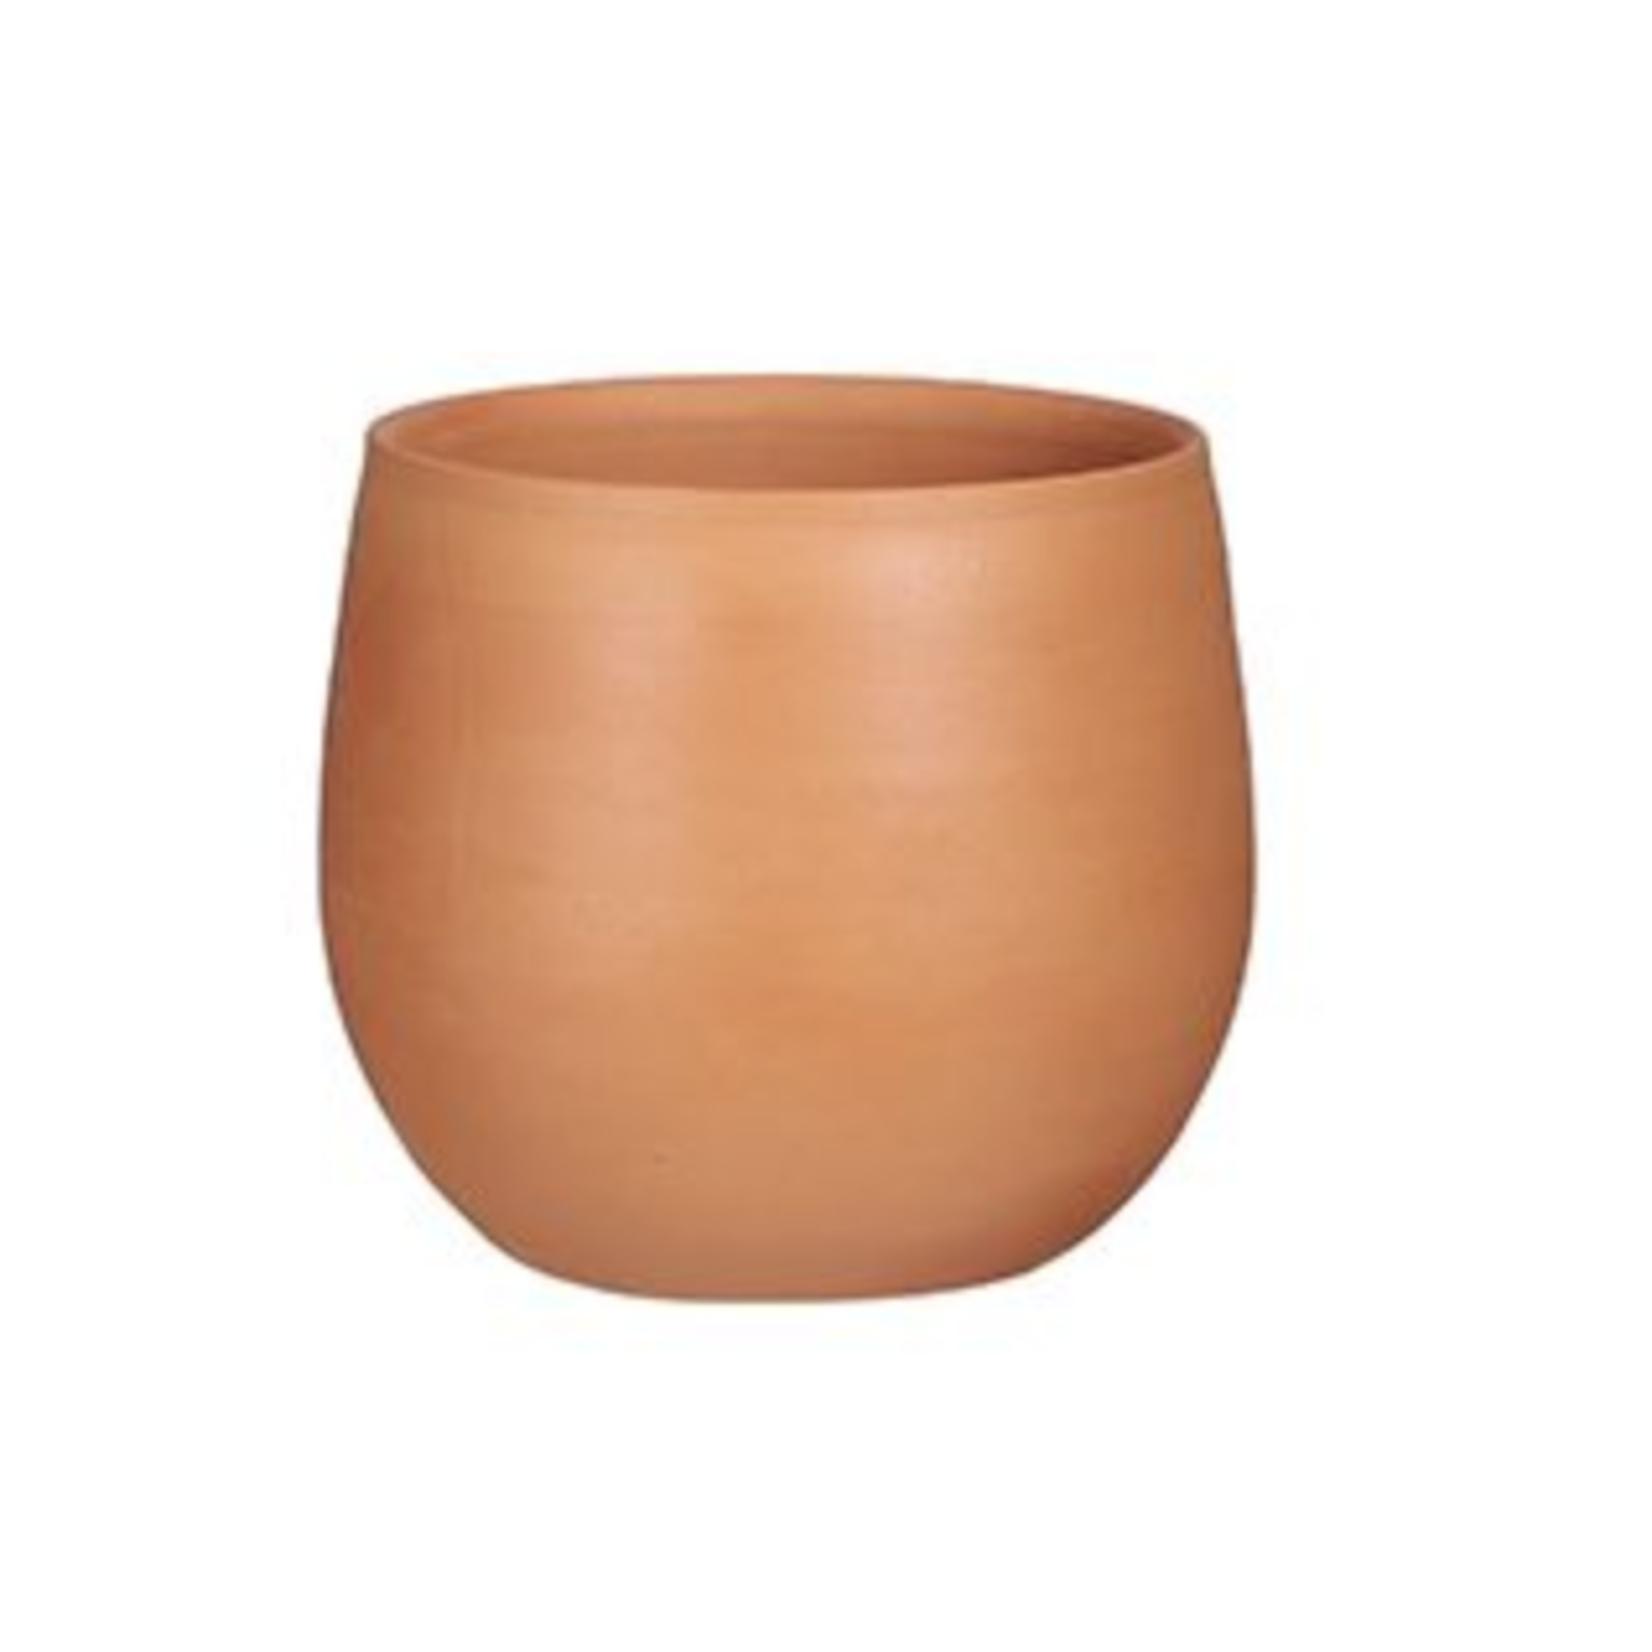 Edelman Oliver terracotta ∅ 16cm